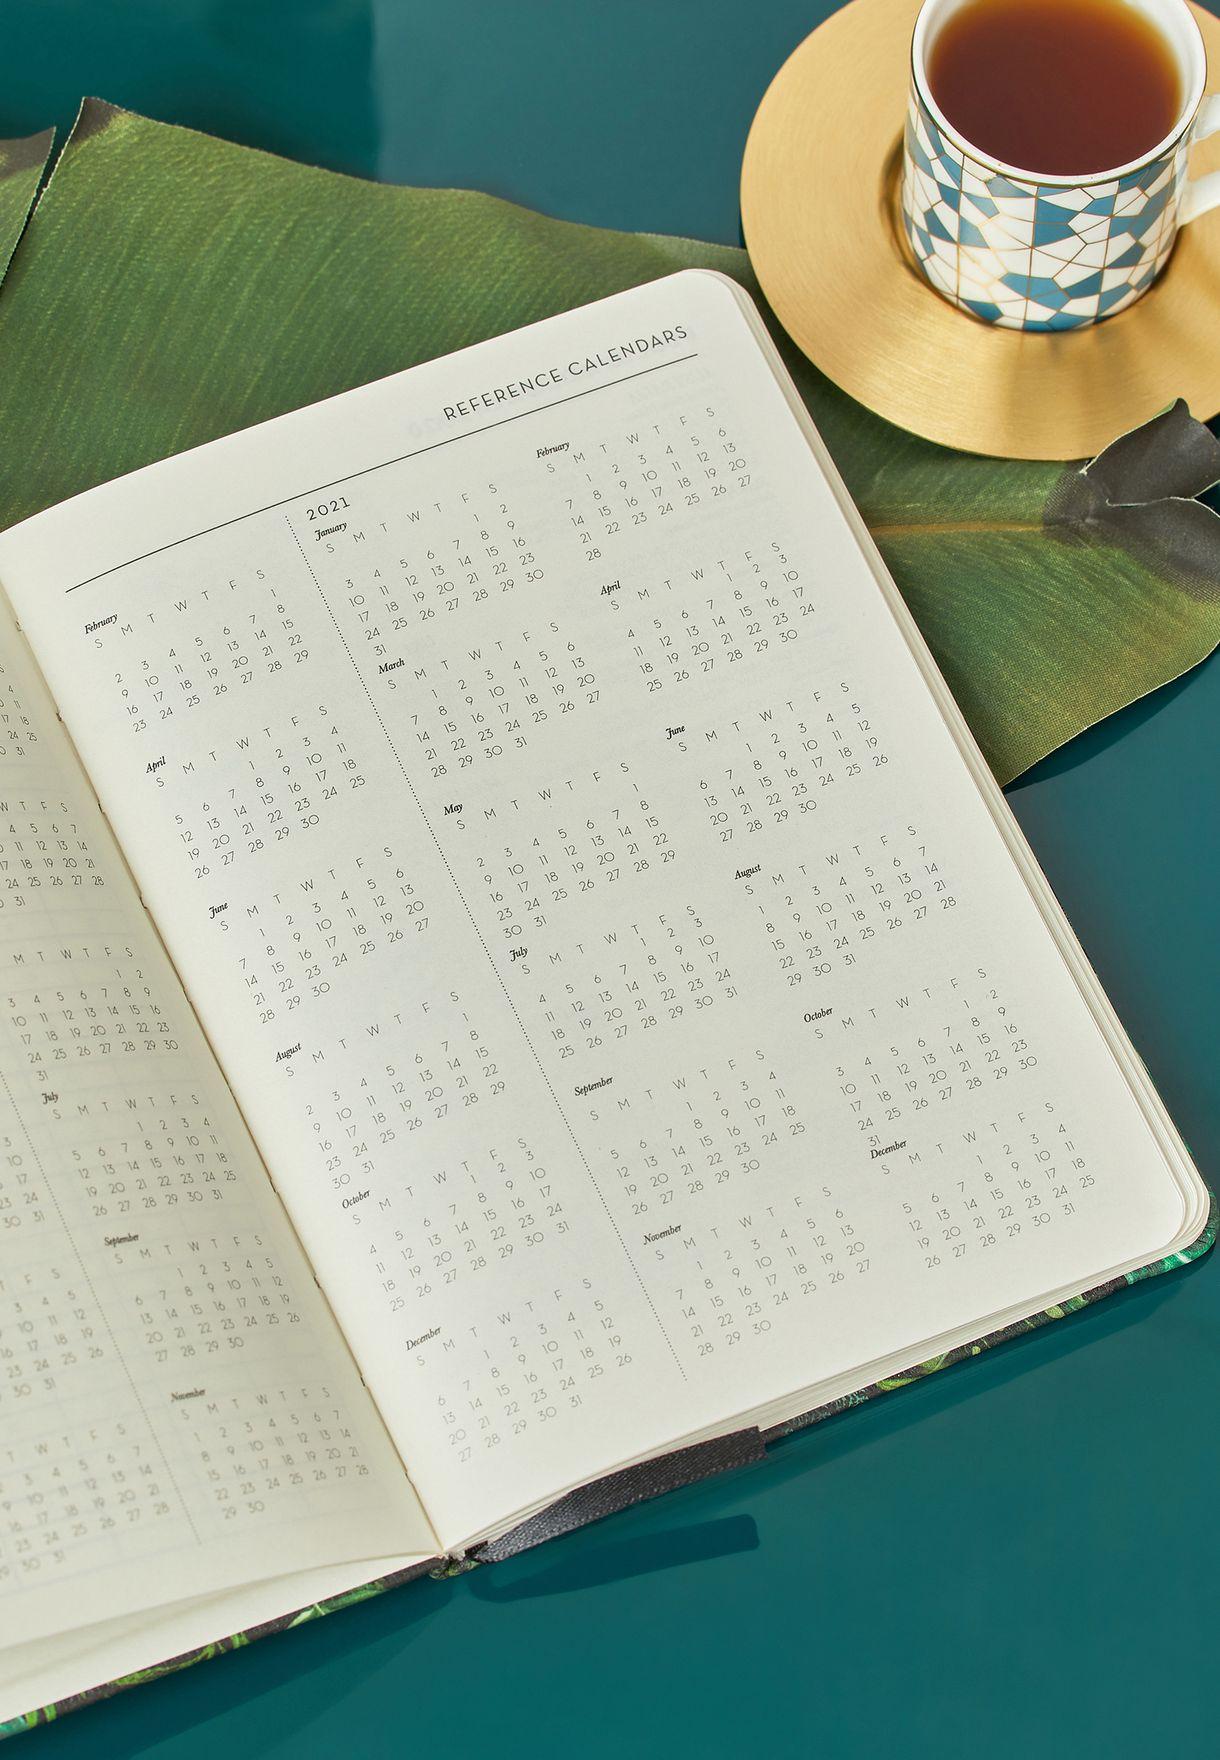 دفتر مذكرات اسبوعي  2020